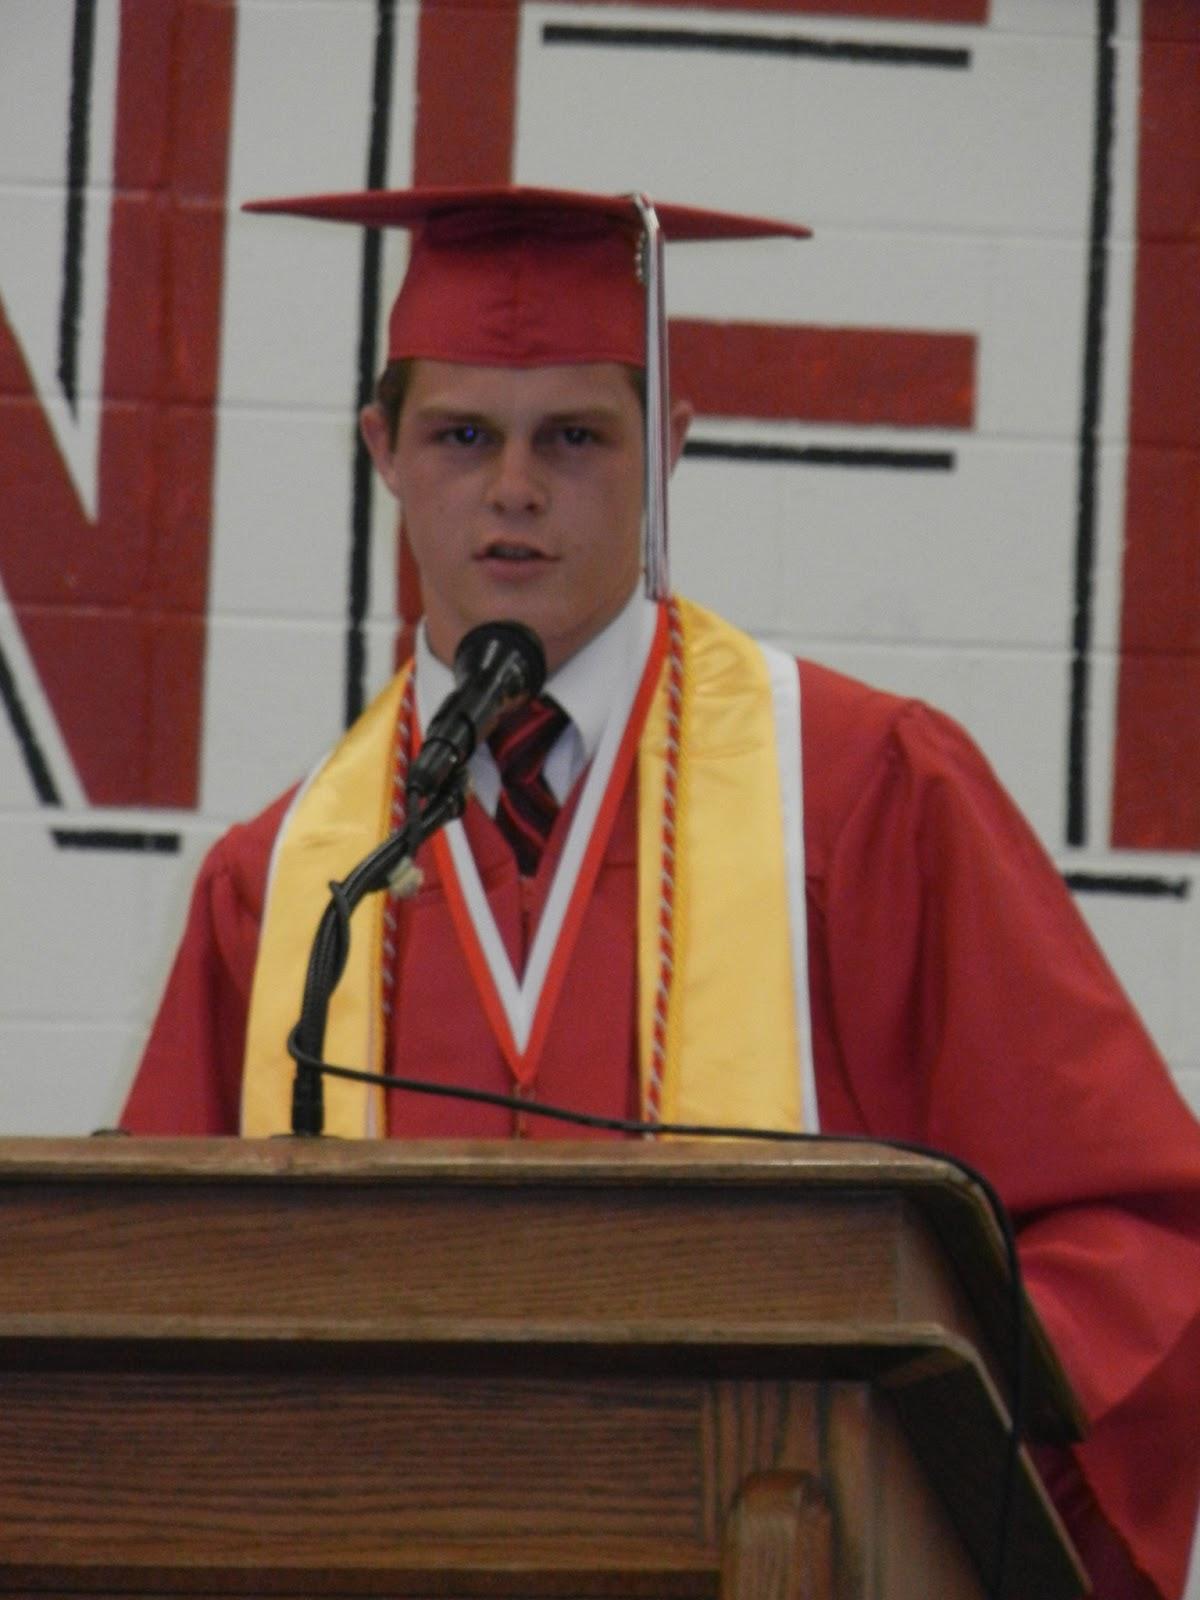 Red dress for 8th grade graduation valedictorian